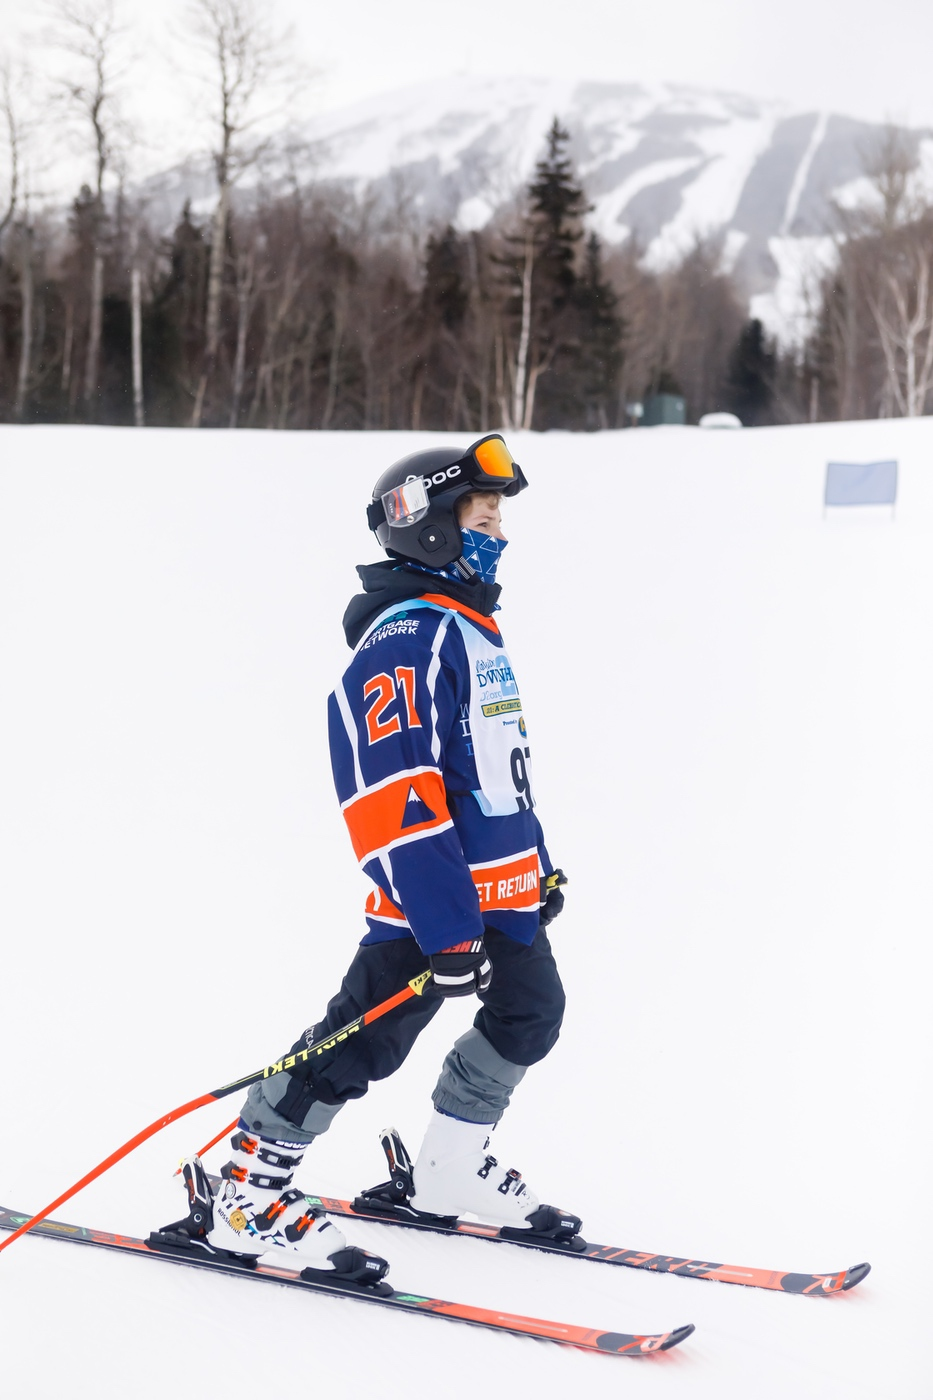 WinterKids Downhill 24 2021 SDP 2643